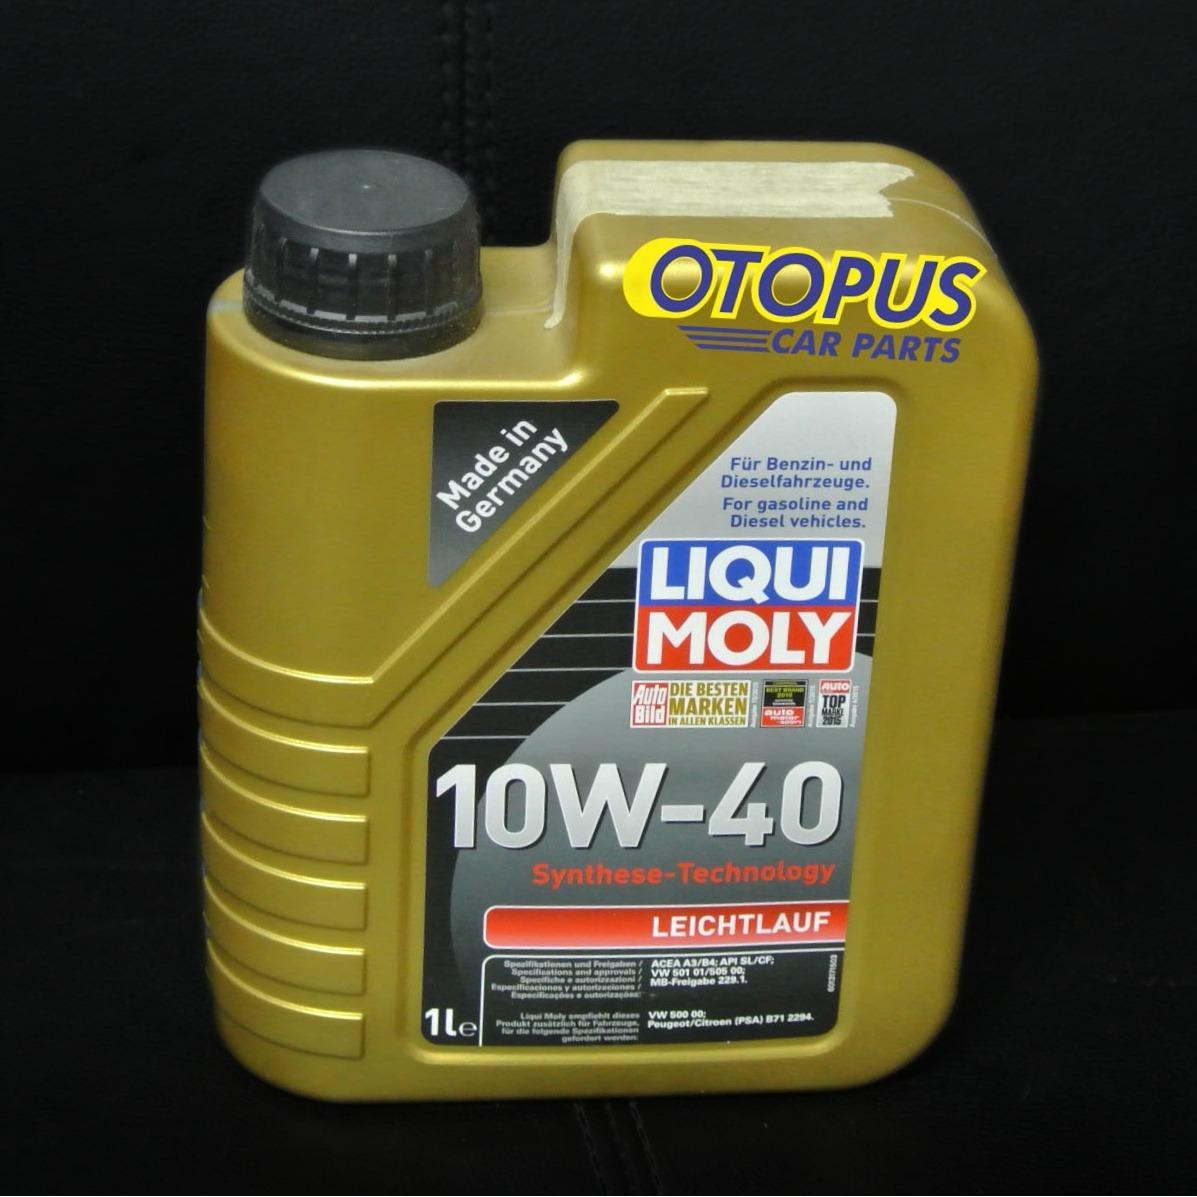 Kehebatan Shell Helix Hx7 10w 40 Api Sn Cf Pelumas Oli Mesin Mobil Ultra 5w Fully Synthetic Oil 4 Liter Liqui Moly Leichtlauf 1 Bensin